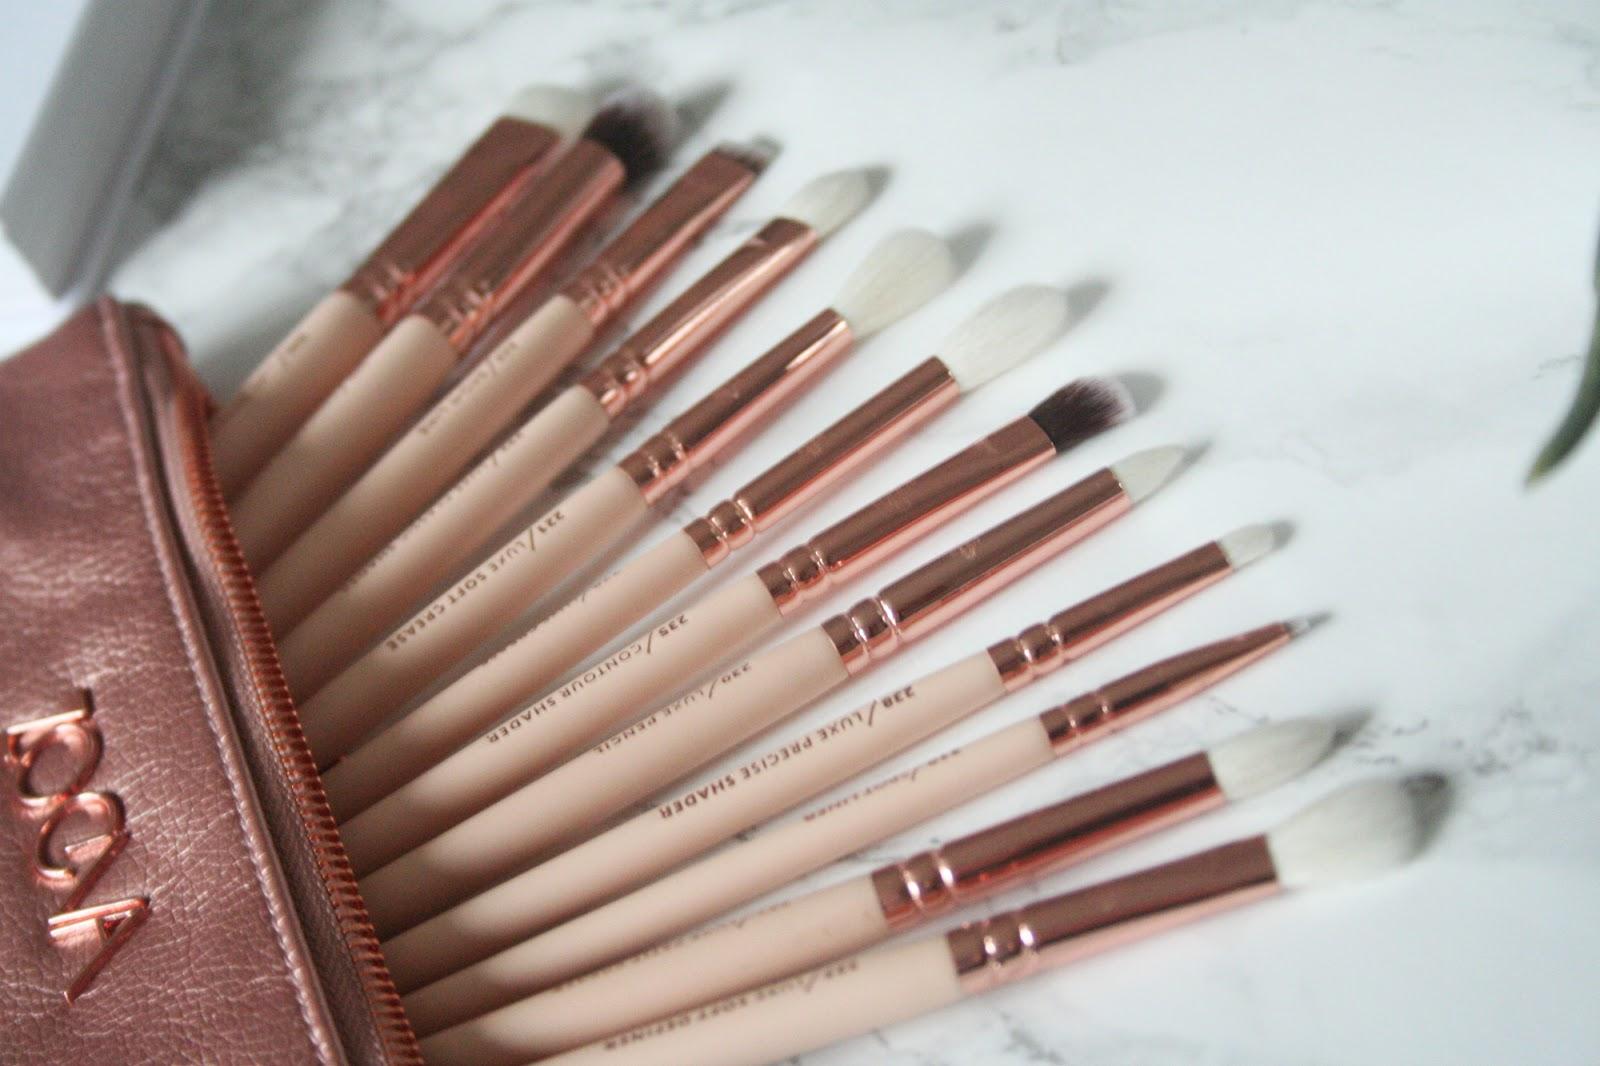 Review, Zoeva Rose Golden Complete Eye Set Vol. 2, Zoeva, Makeup Brushes